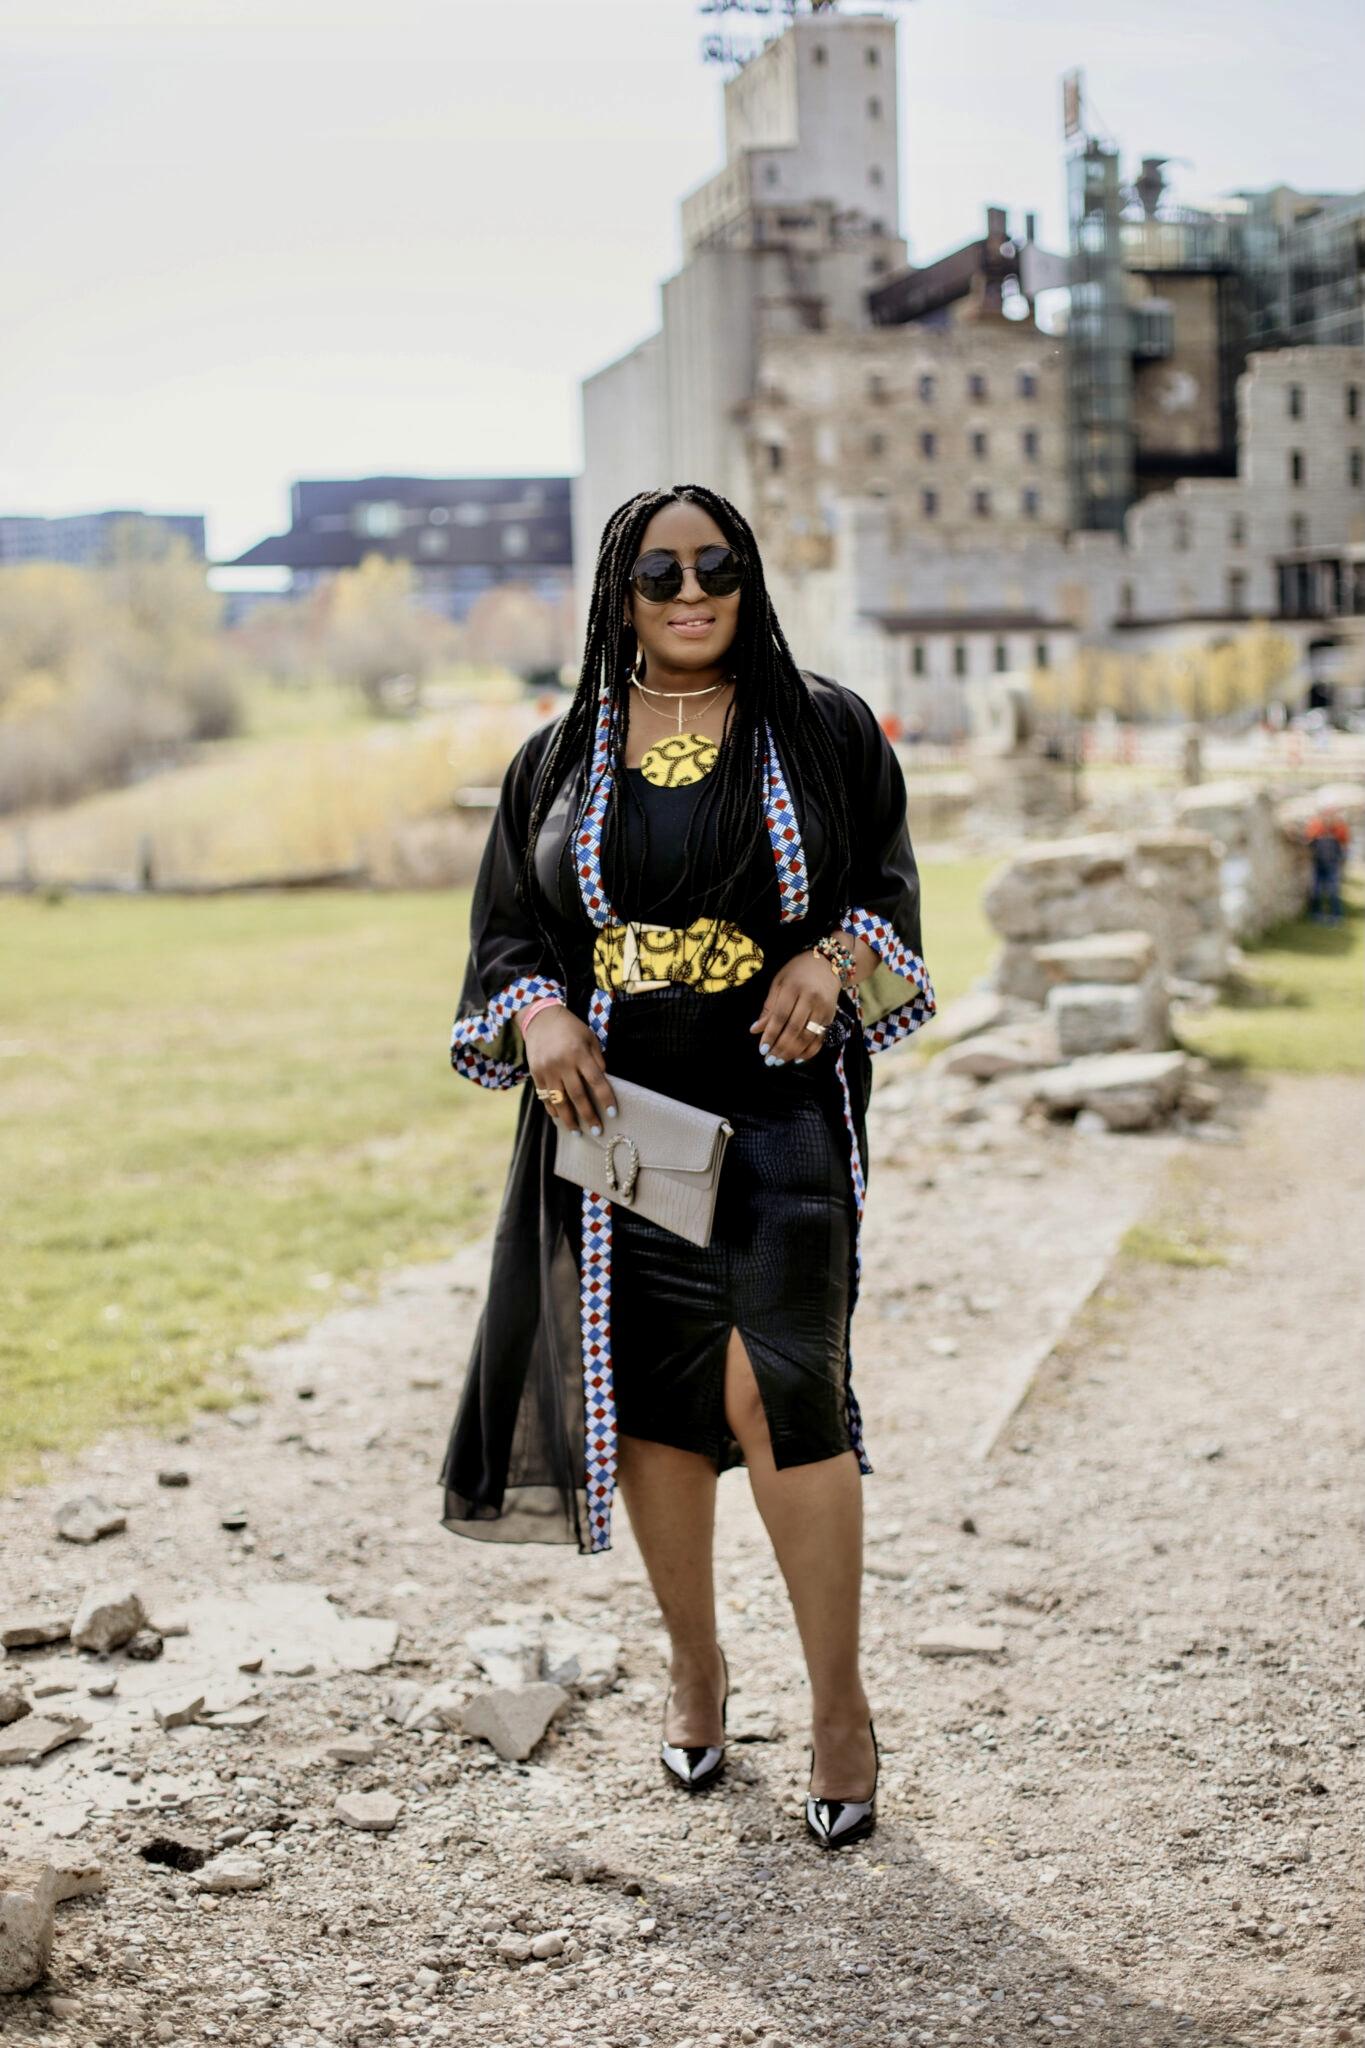 Fasjion-blogger-hypnozglam-kimono-dress- african-prints